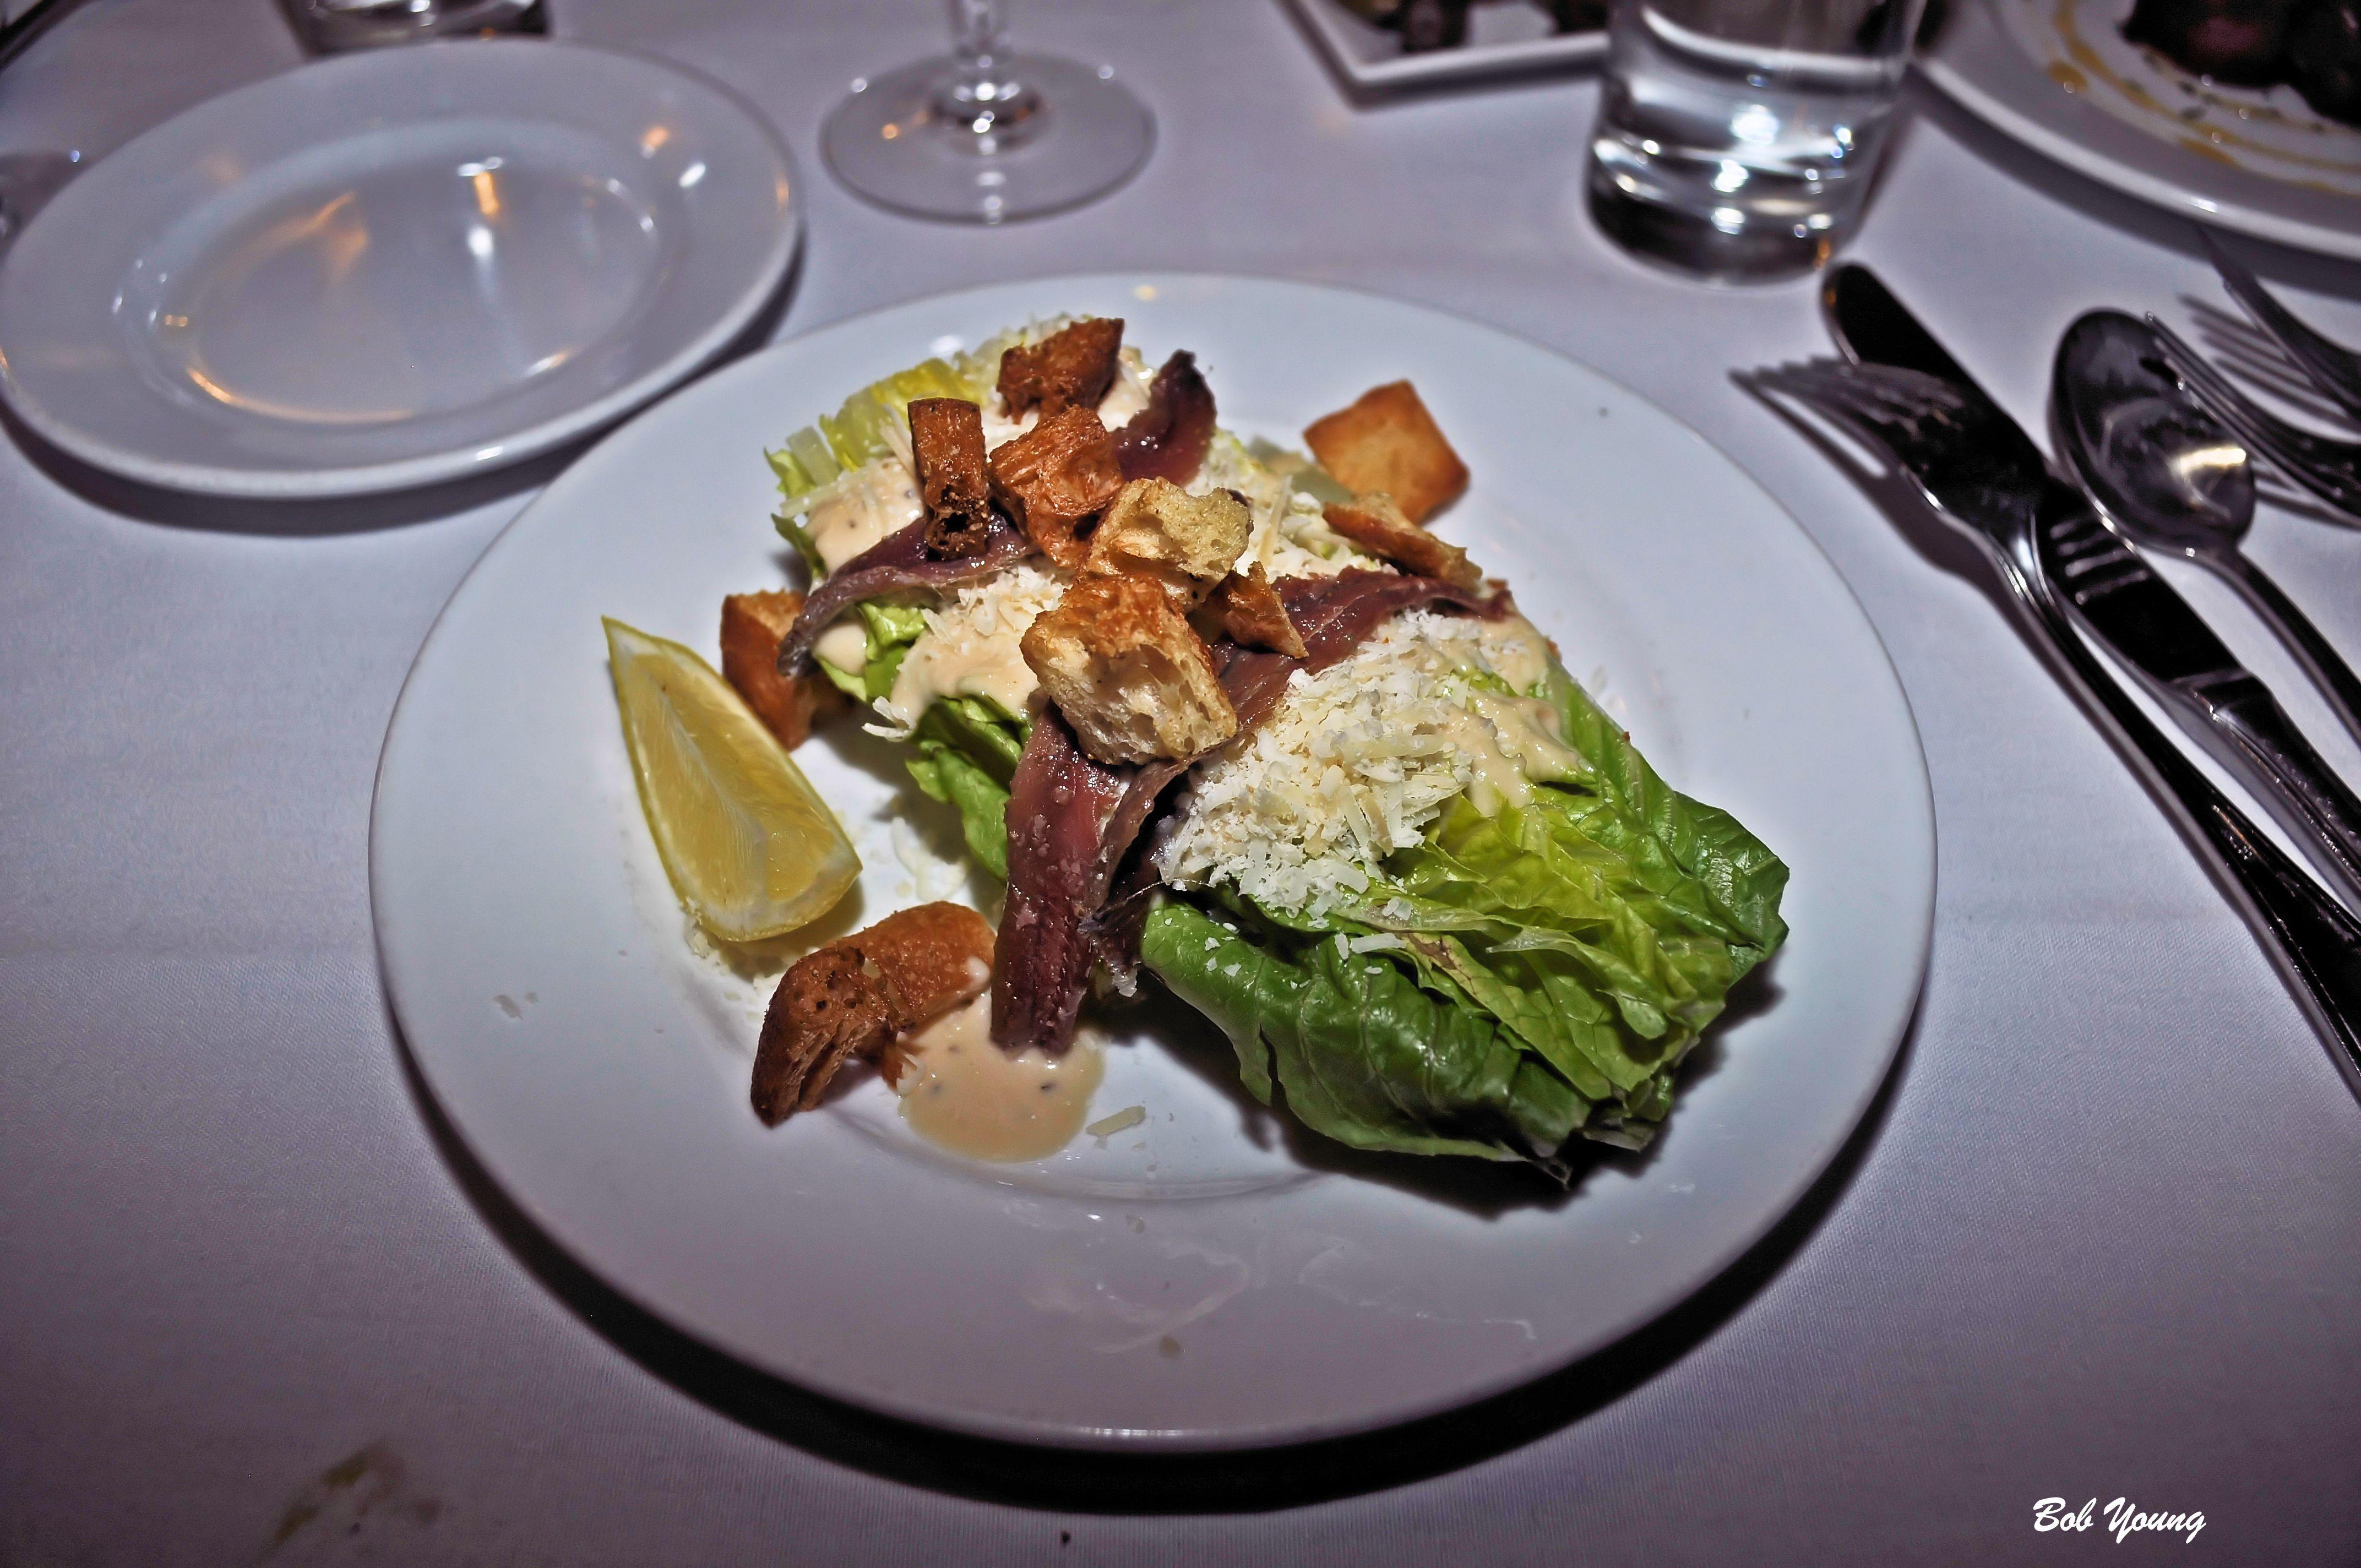 caesar salad kale caesar salad caesar salad burger texas caesar salad ...